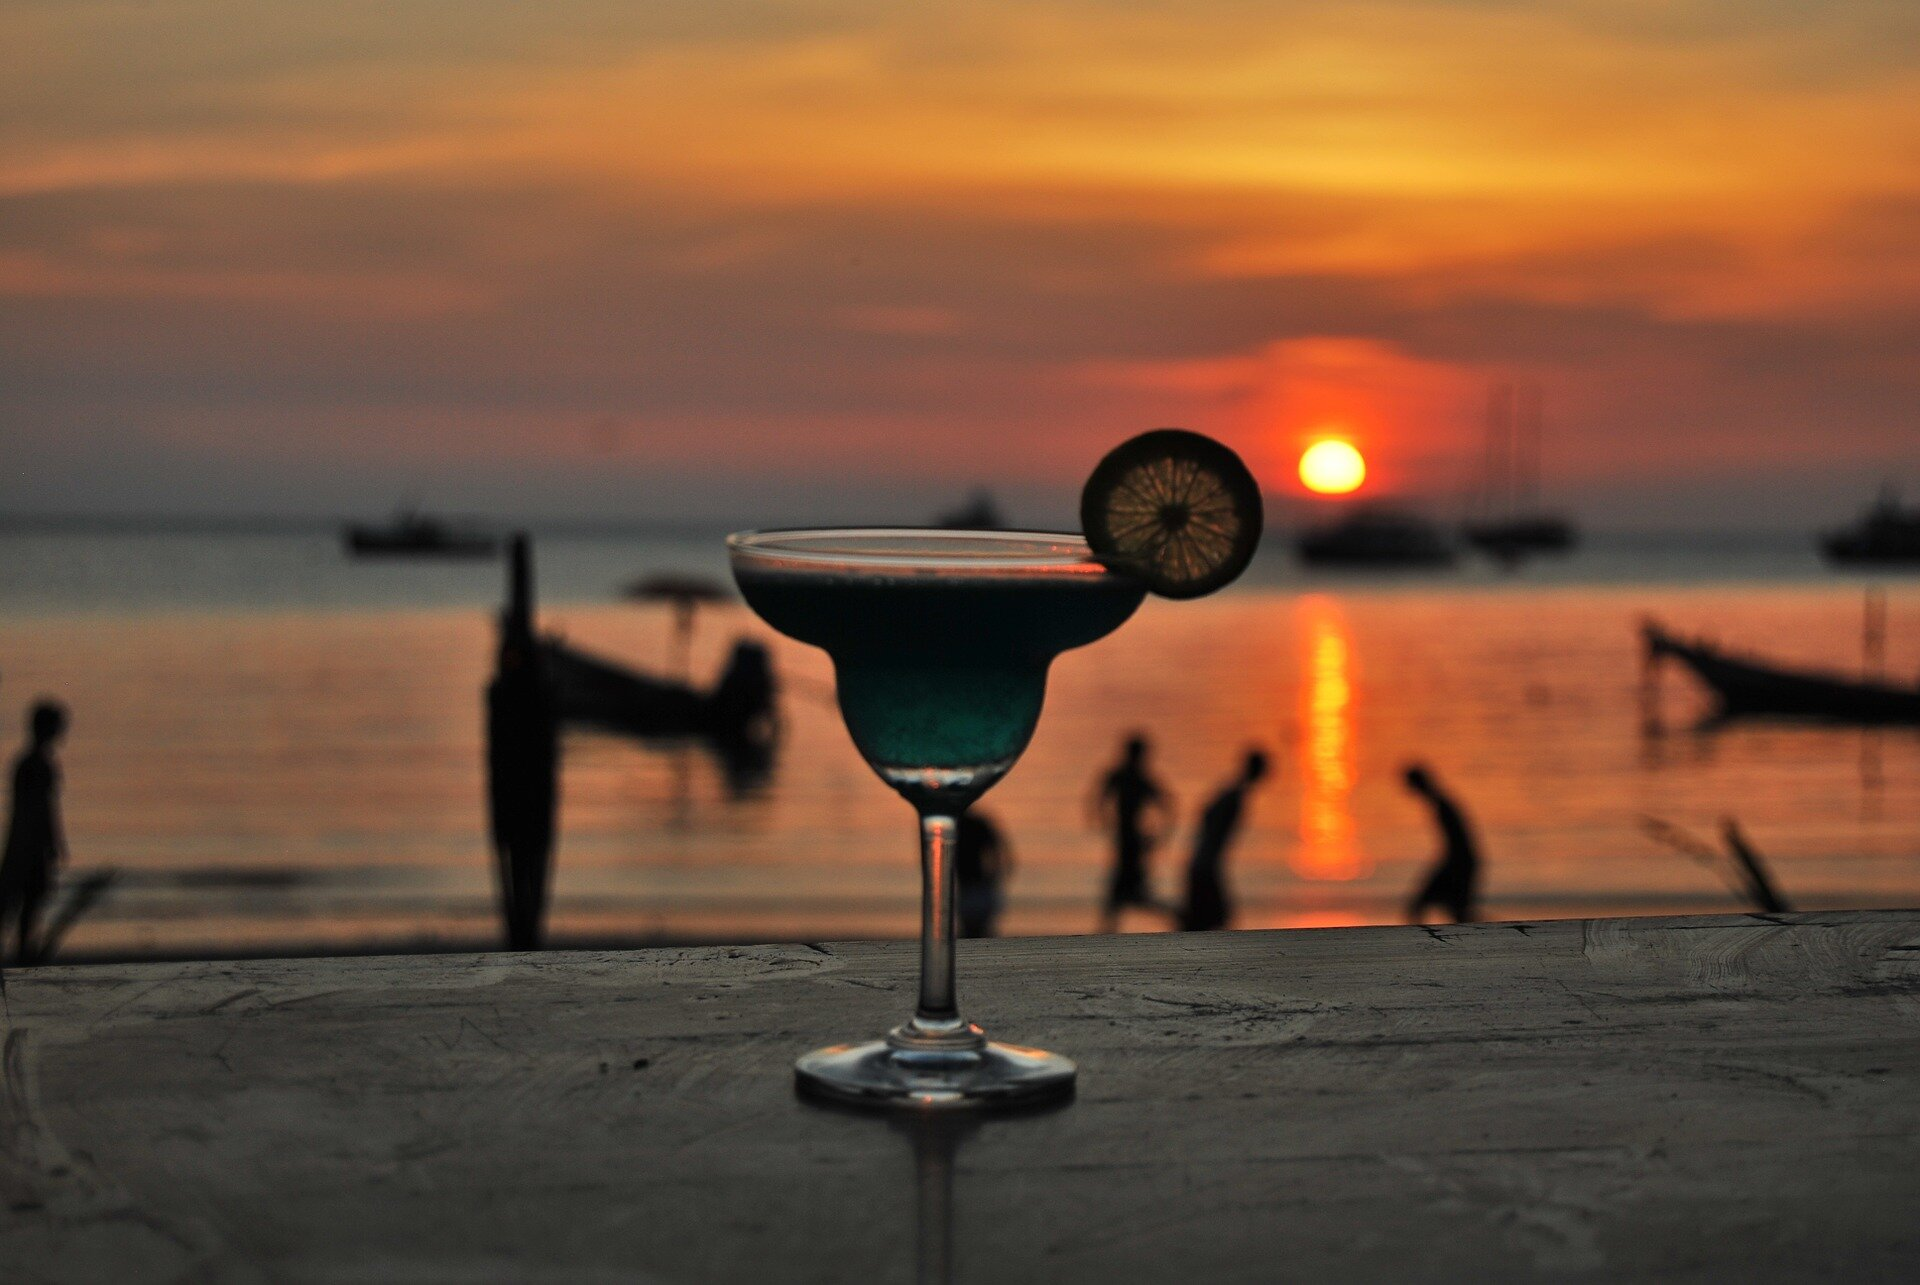 cocktail-1042330_1920.jpg